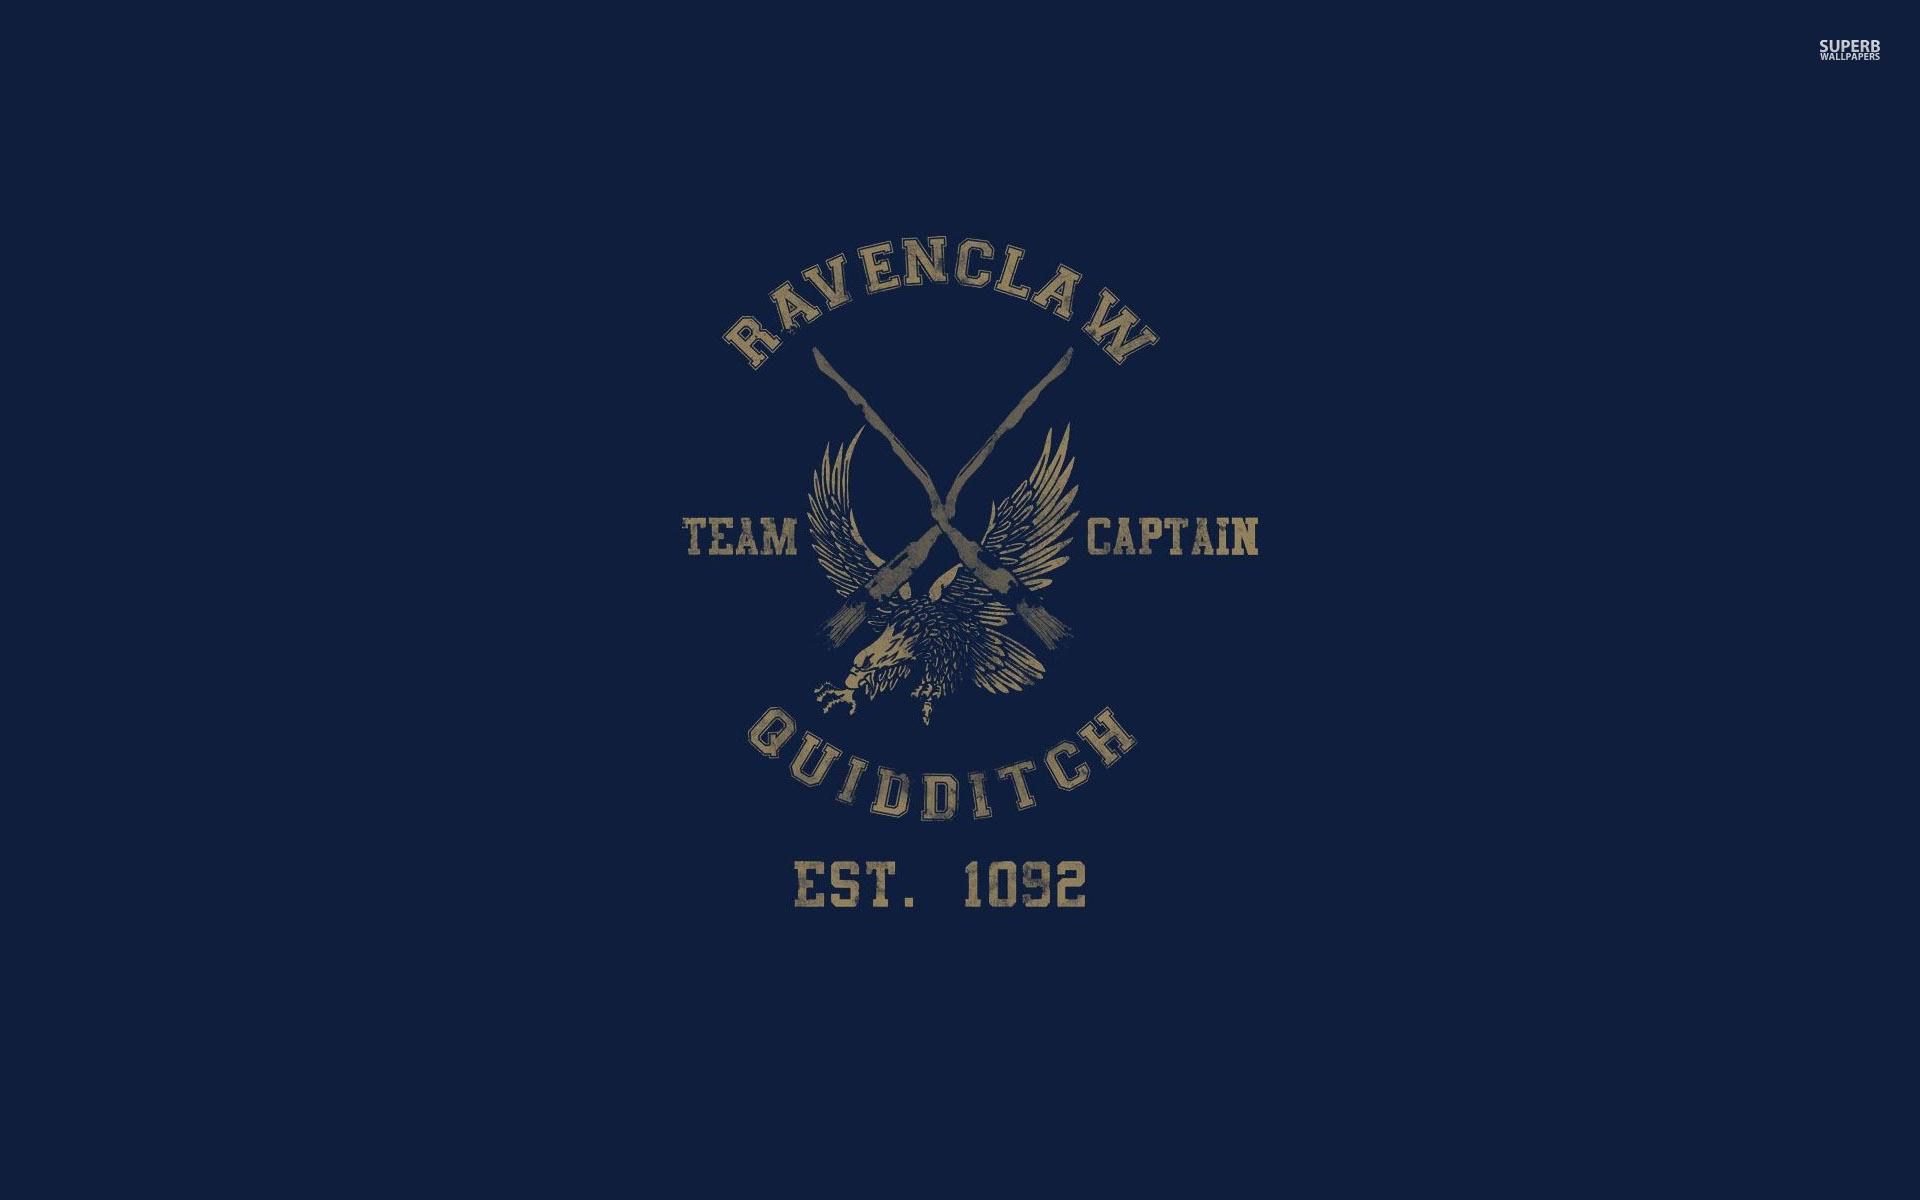 ravenclaw wallpaper hd stay031   staywallpaper